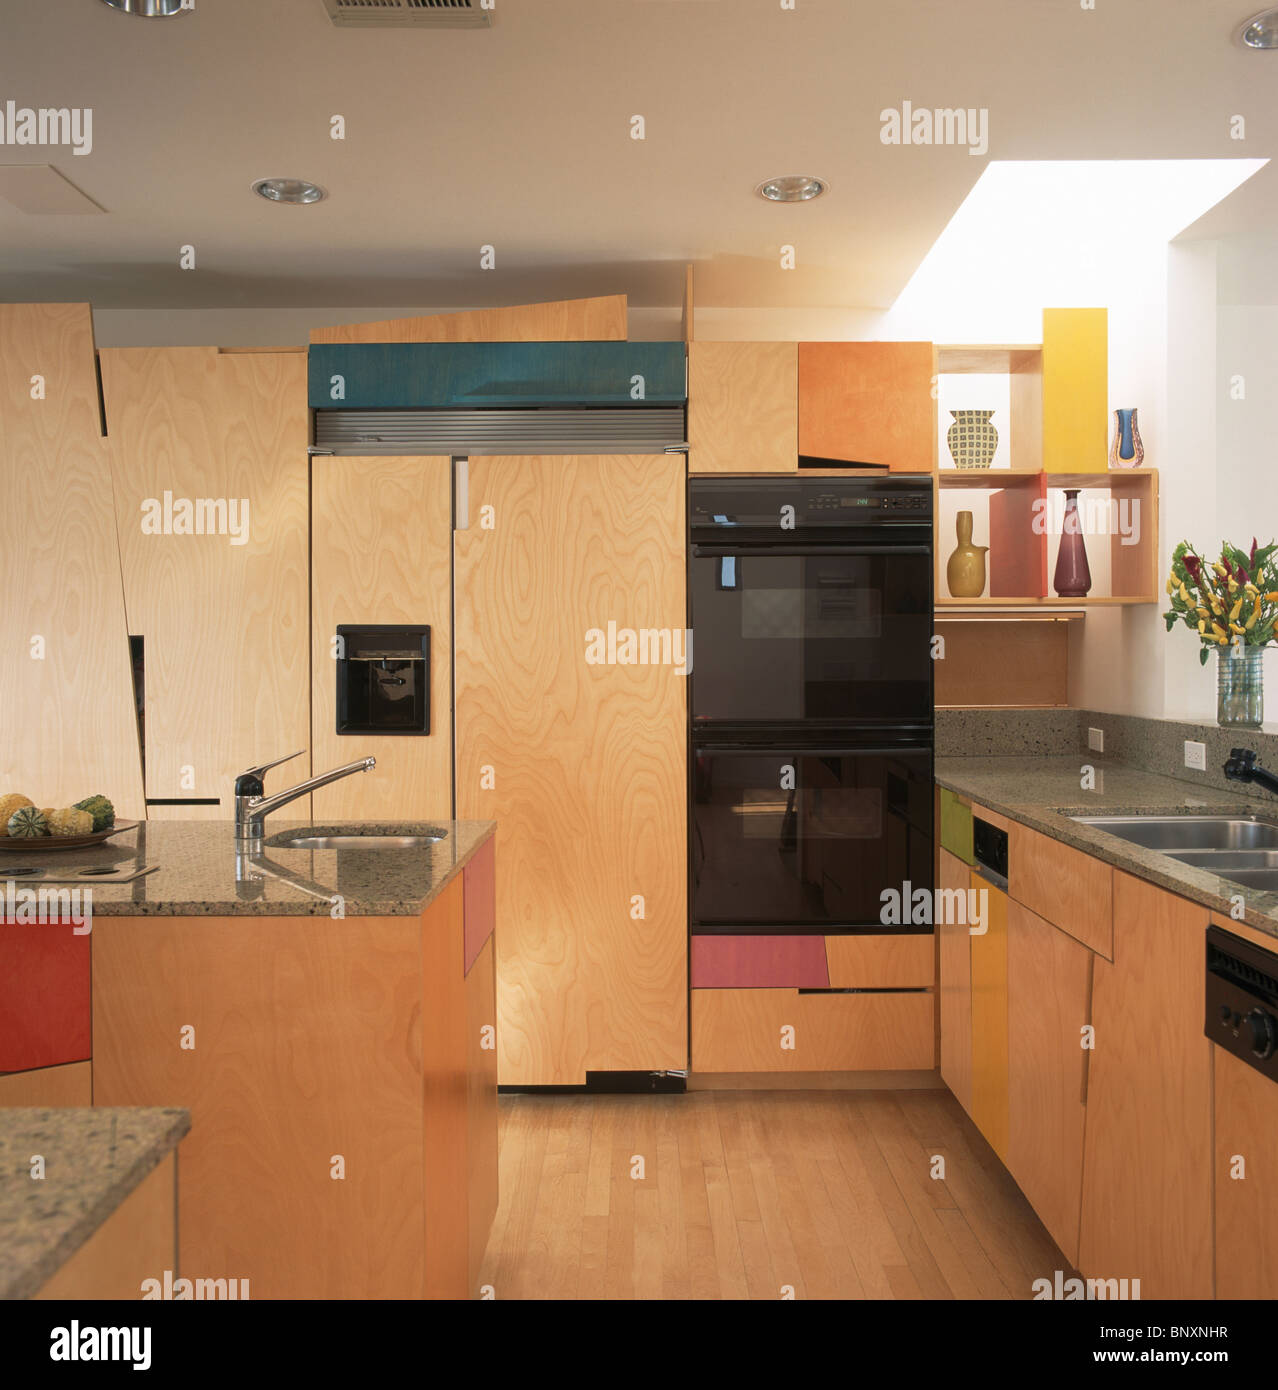 interiors modern kitchens fridge freezers stockfotos interiors modern kitchens fridge freezers. Black Bedroom Furniture Sets. Home Design Ideas